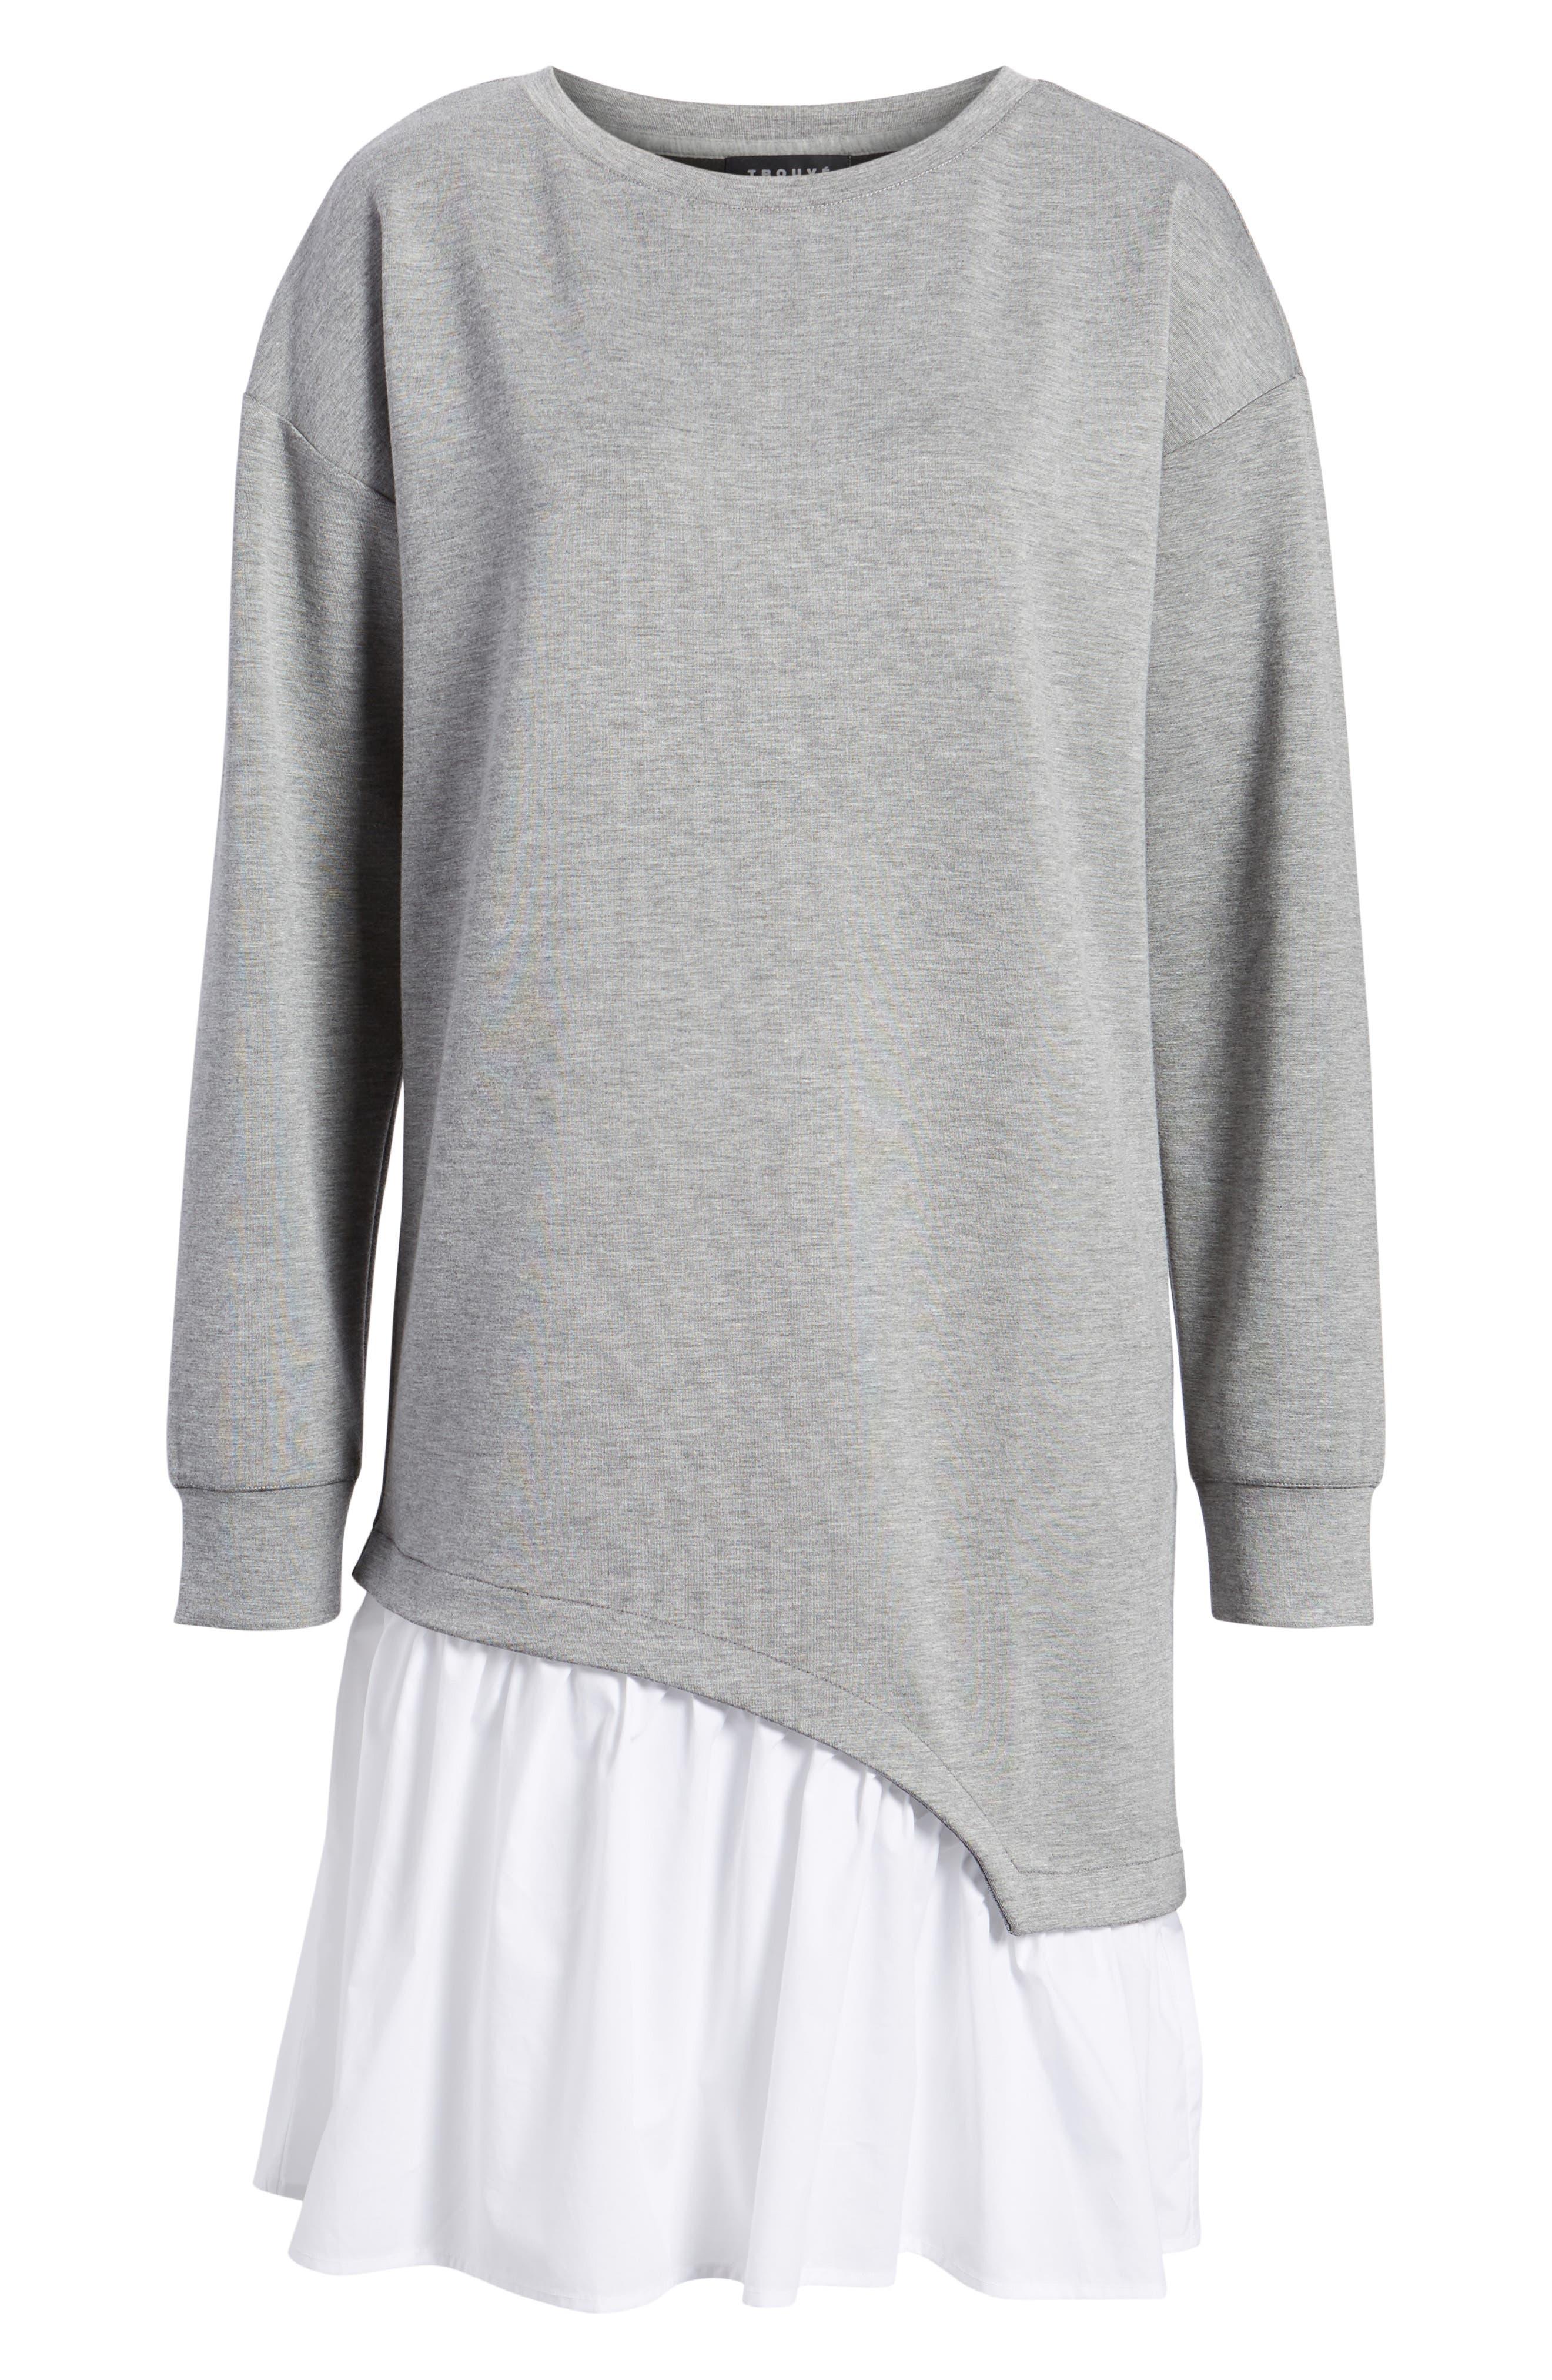 Mixed Media Sweatshirt Dress,                             Alternate thumbnail 6, color,                             030